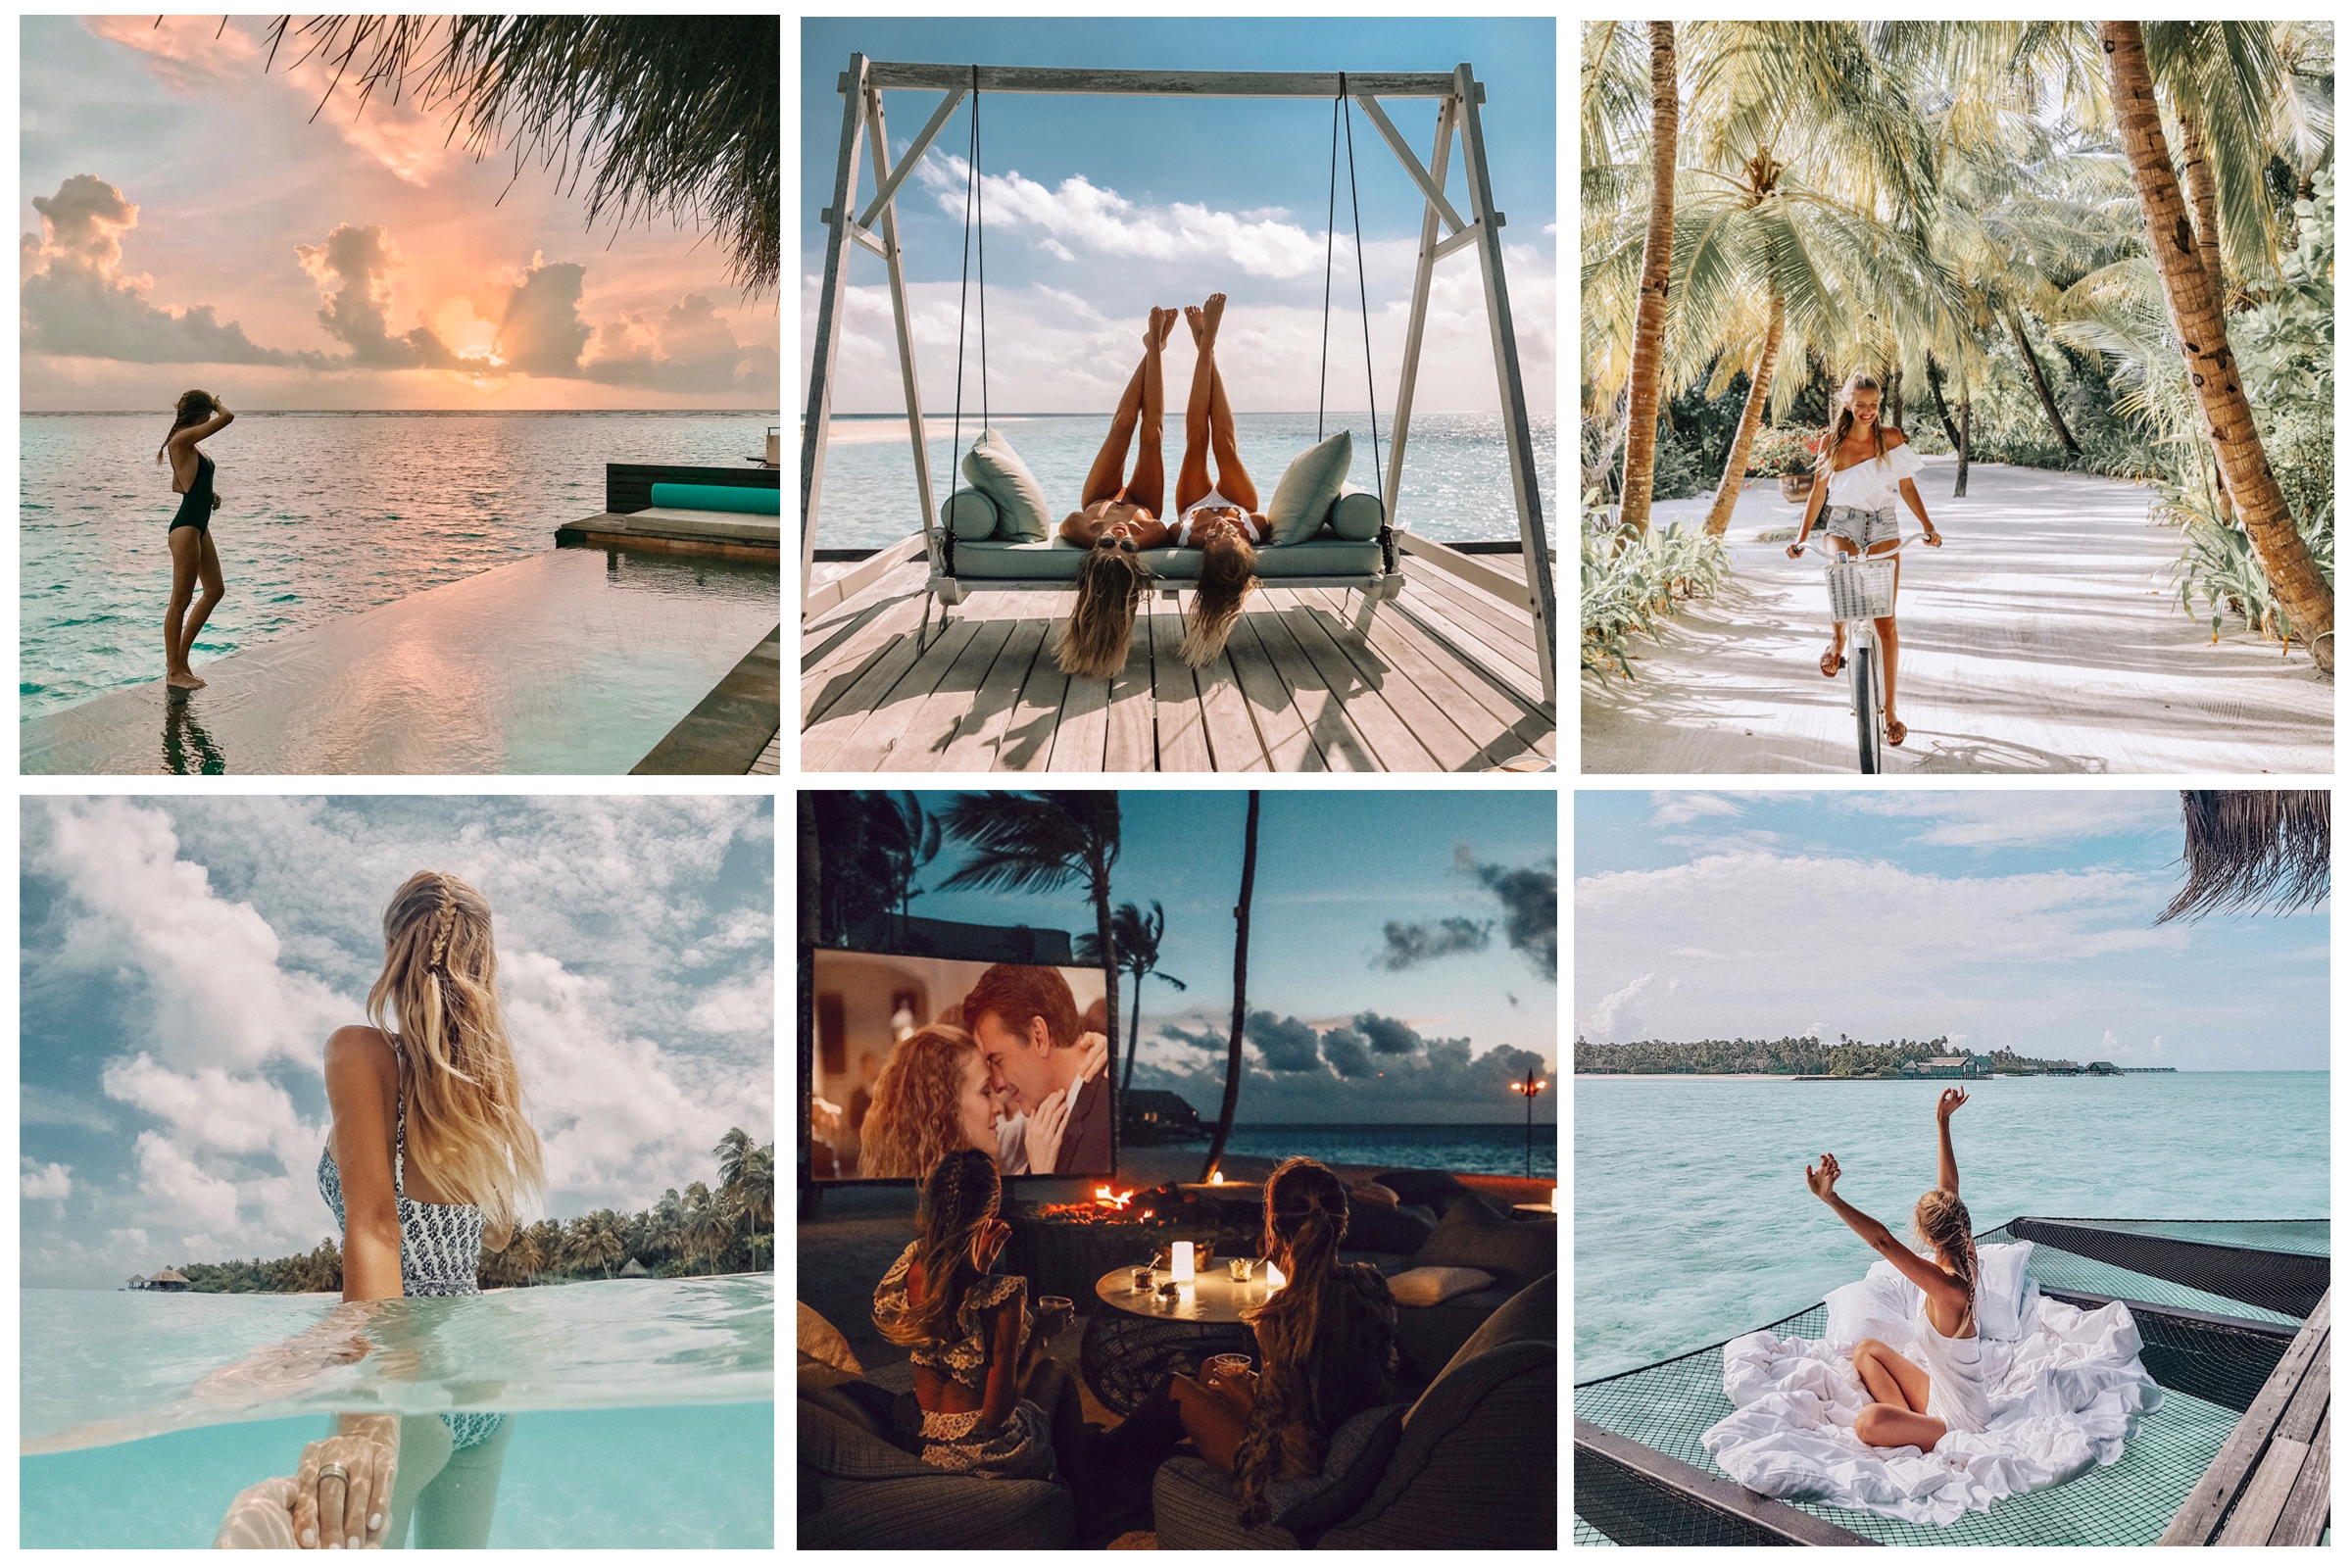 Maldives '17